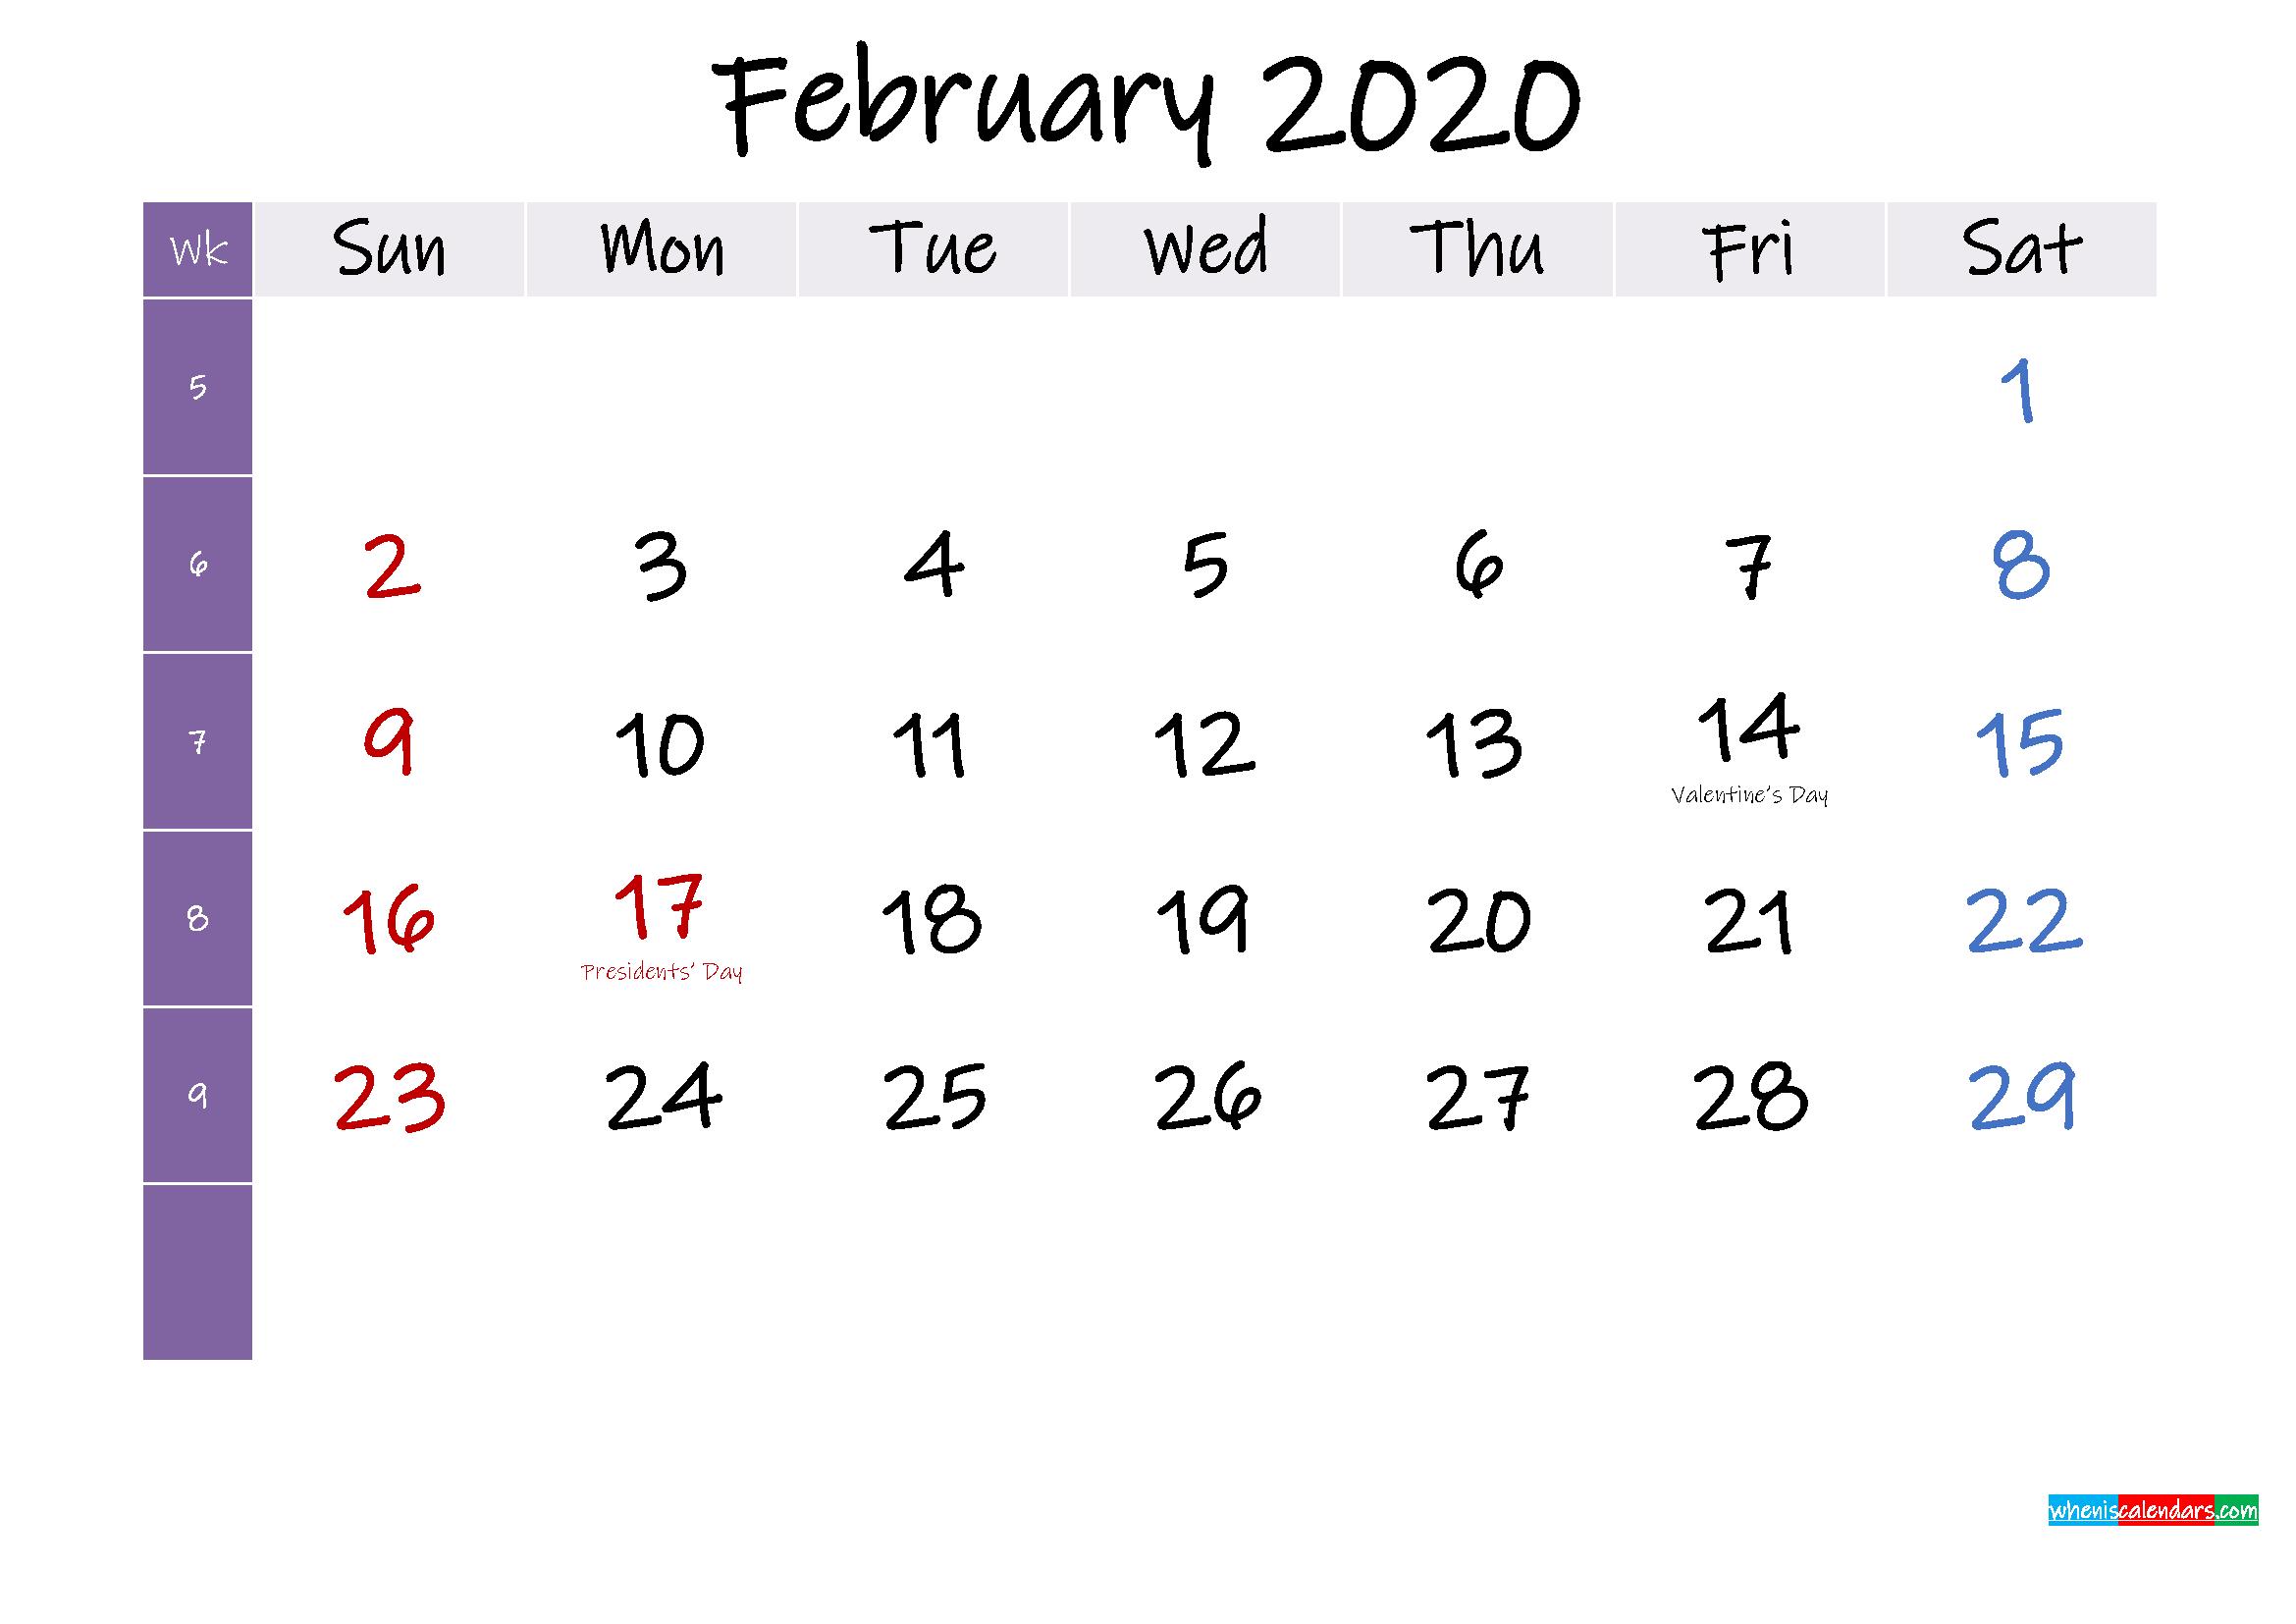 February 2020 Free Printable Calendar with Holidays